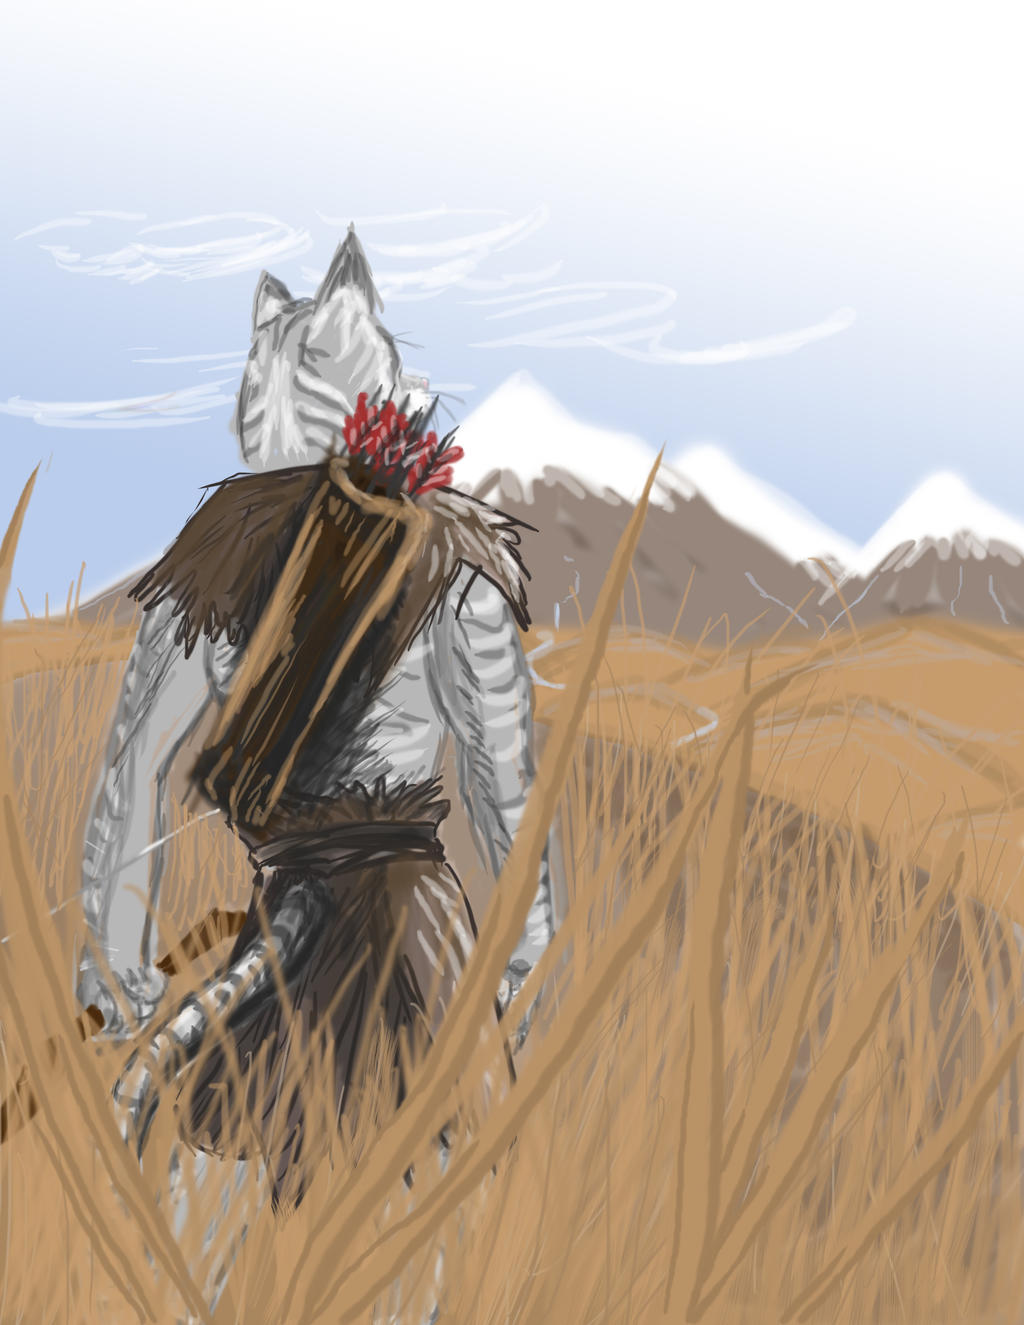 Kznraast's First Step into Skyrim by Letviathan